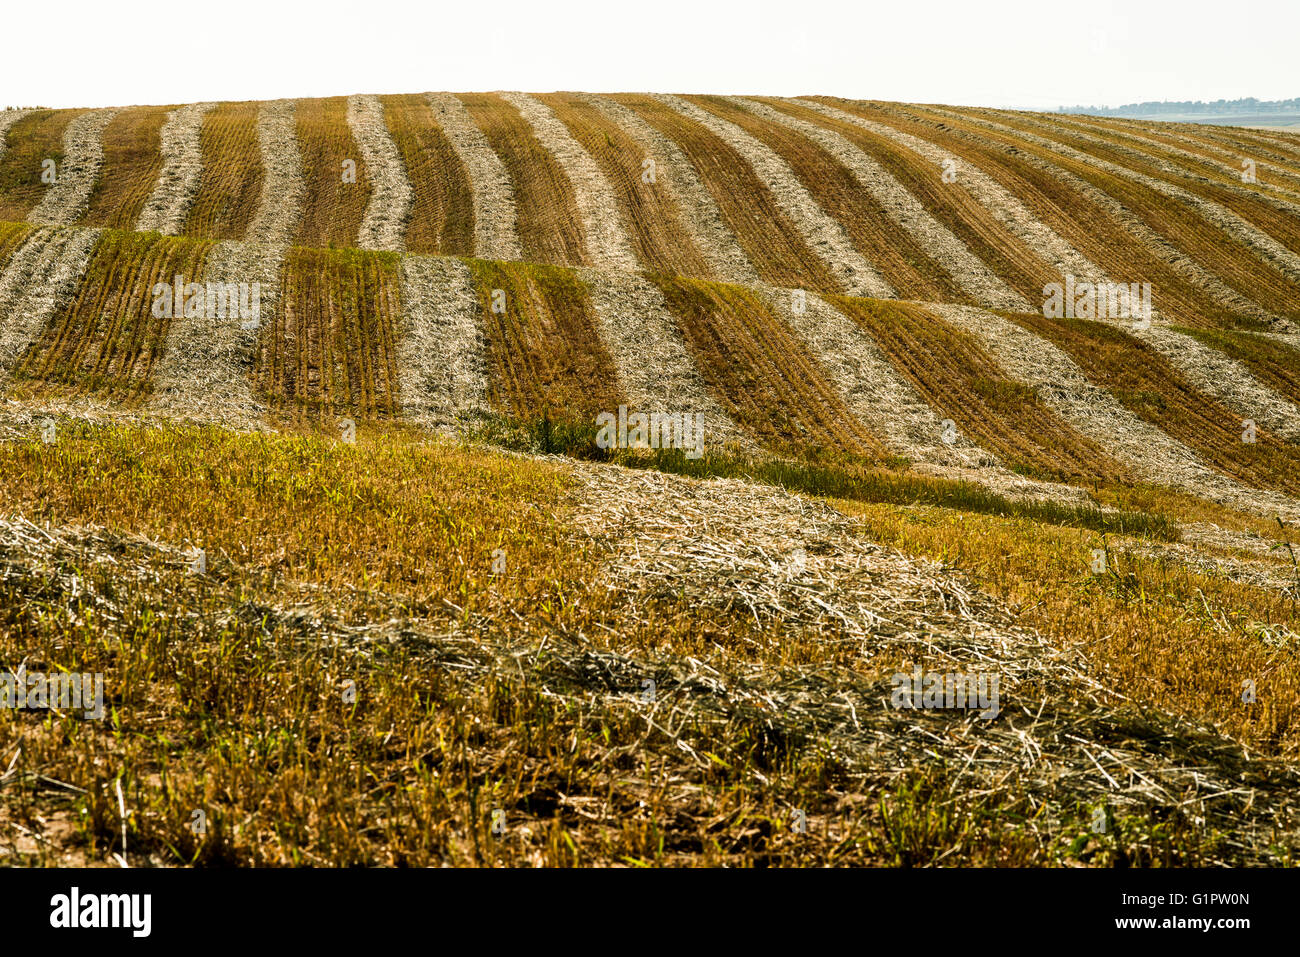 Desert agriculture. Harvested wheat field in the Negev Desert, Israel - Stock Image